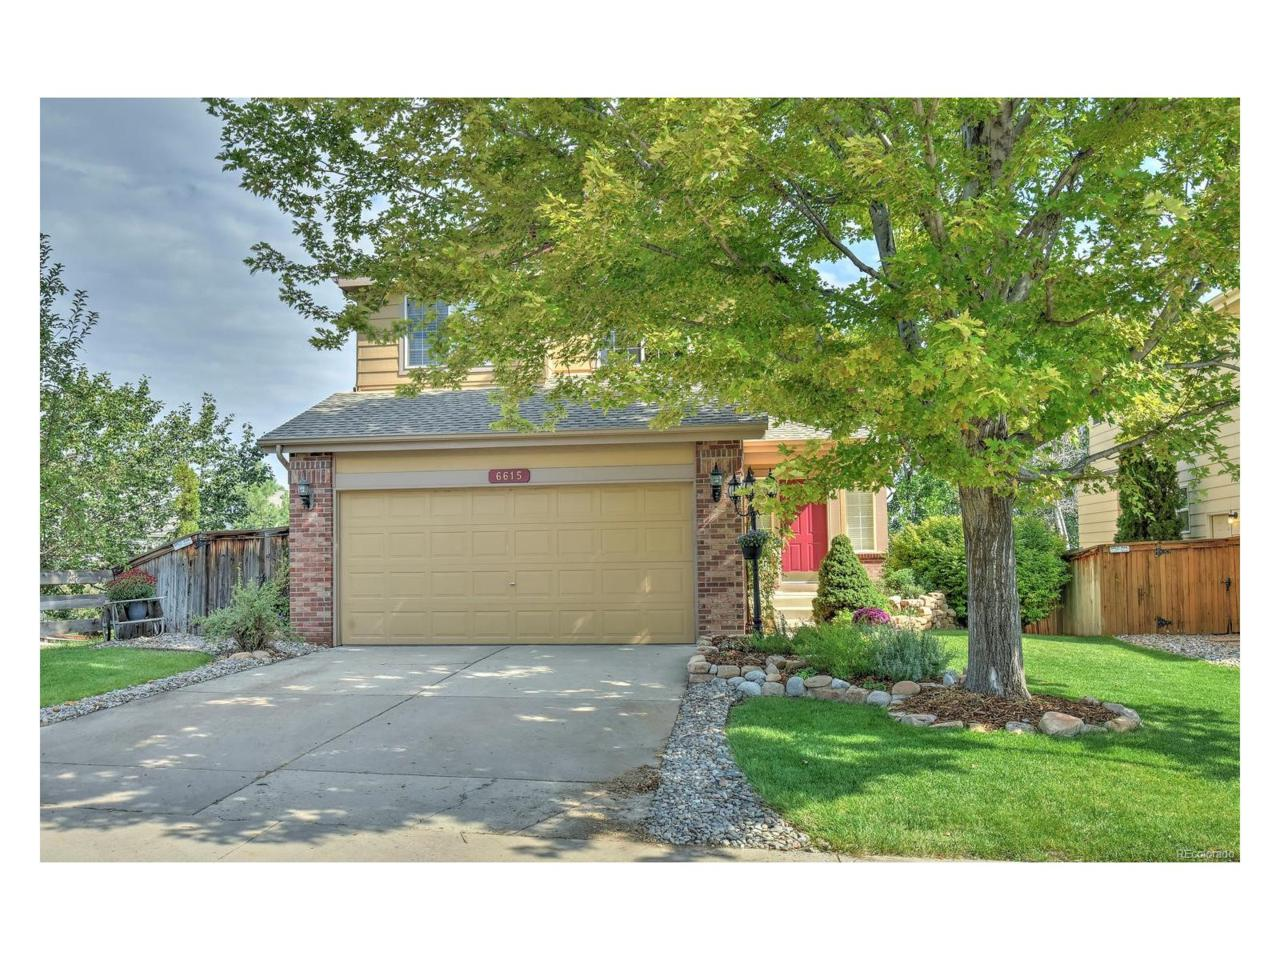 6615 Lionshead Parkway, Littleton, CO 80124 (MLS #3604854) :: 8z Real Estate